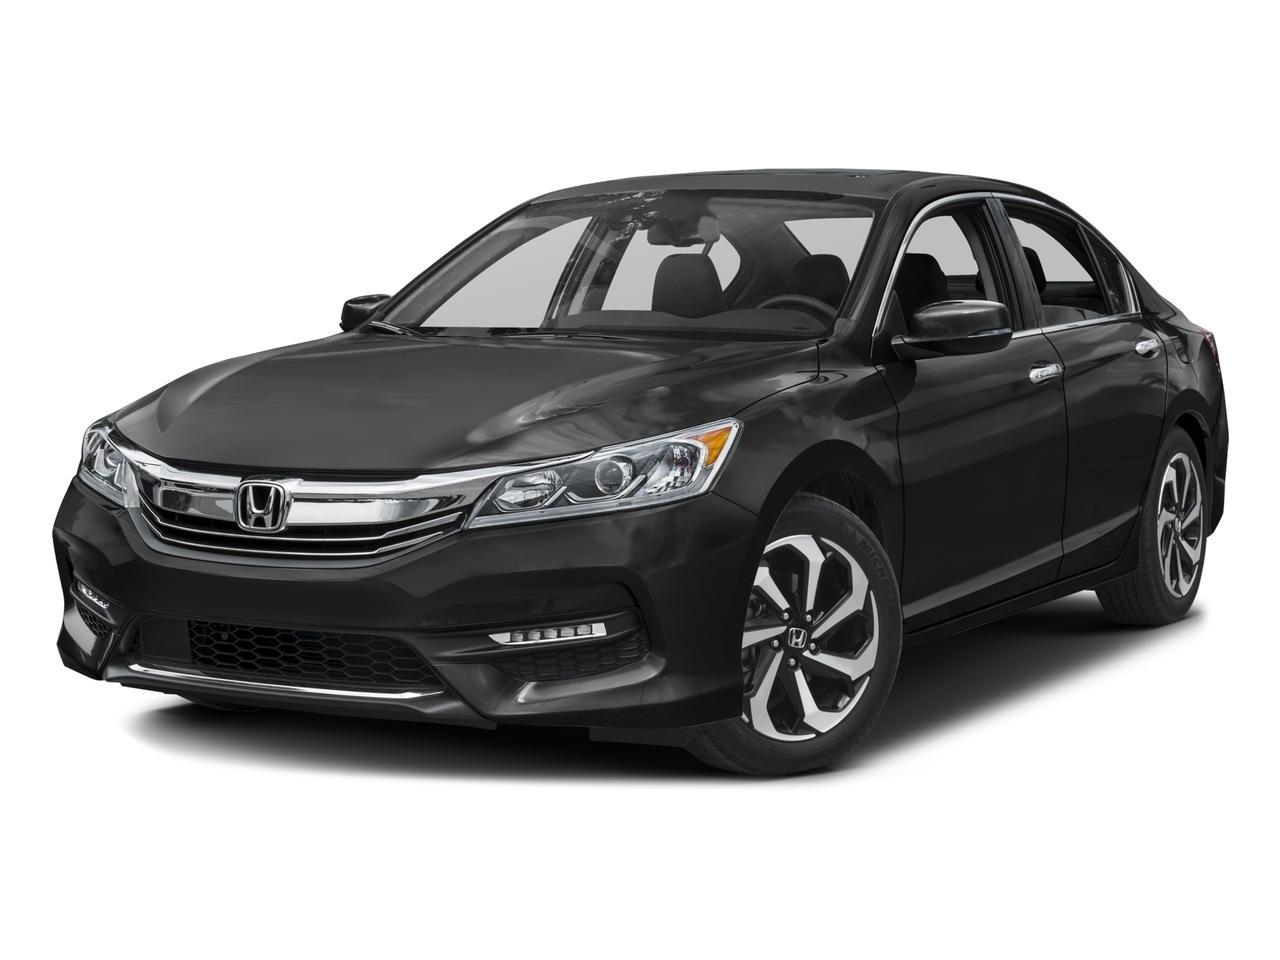 2016 Honda Accord Sedan Vehicle Photo in Houston, TX 77054